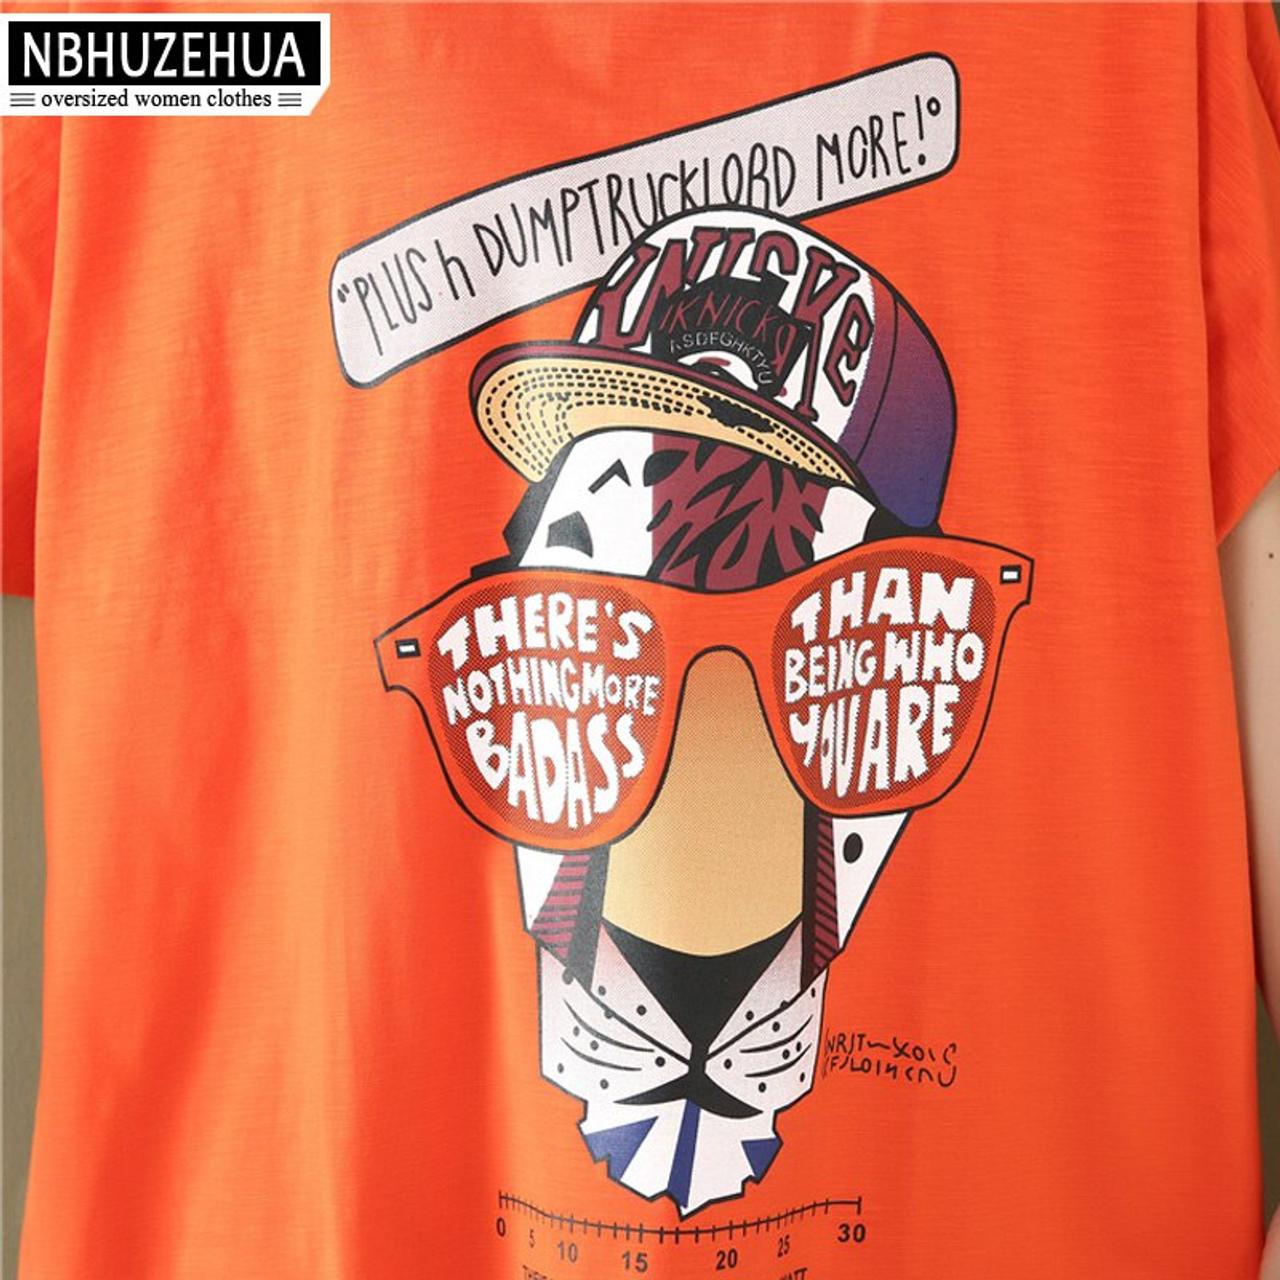 faf3c6fc1b ... NBHUZEHUA 7G689 Summer Long Women Tops Harajuku Kawaii Cartoon Printed  T-Shirt Big Size Loose ...